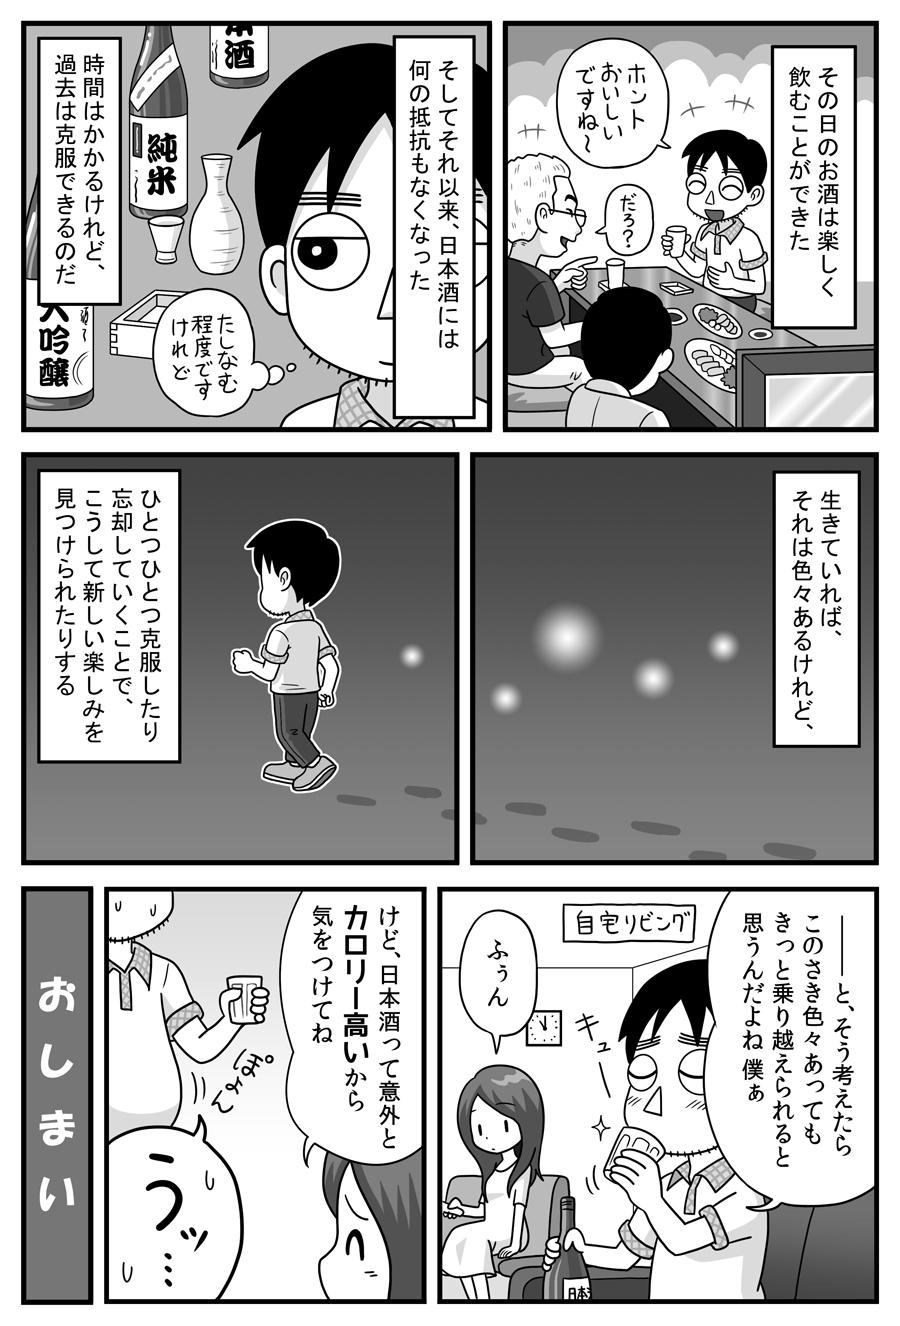 tokonokubo-b09-P06a.jpg